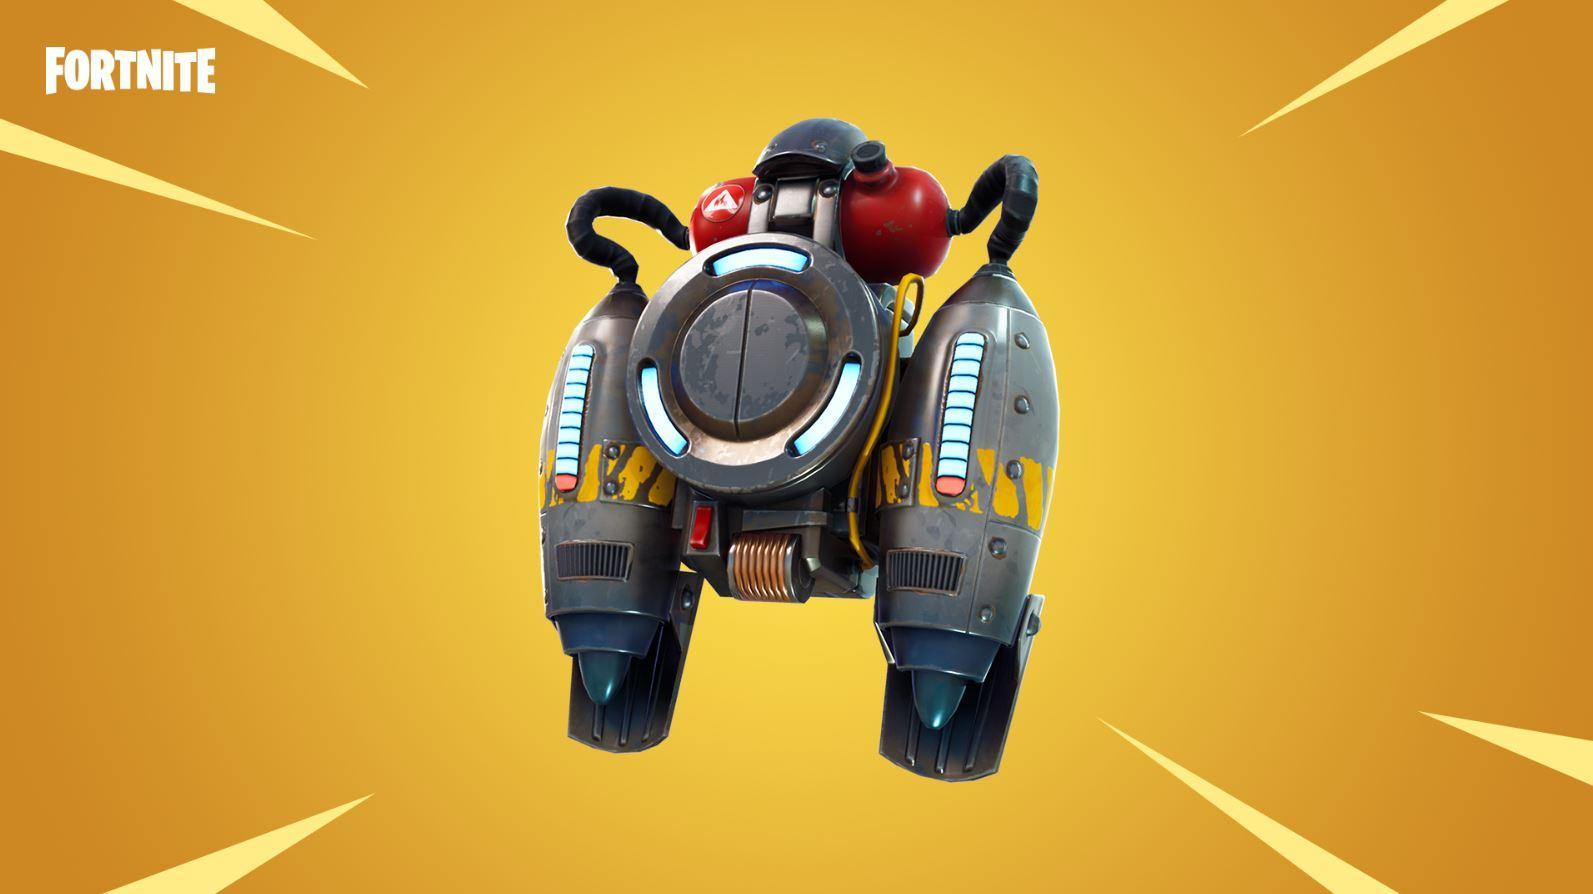 Fortnite Can't Enter Game Fortnite V4 2 Content Update Serves Up Jetpacks New Game Modes Slashgear